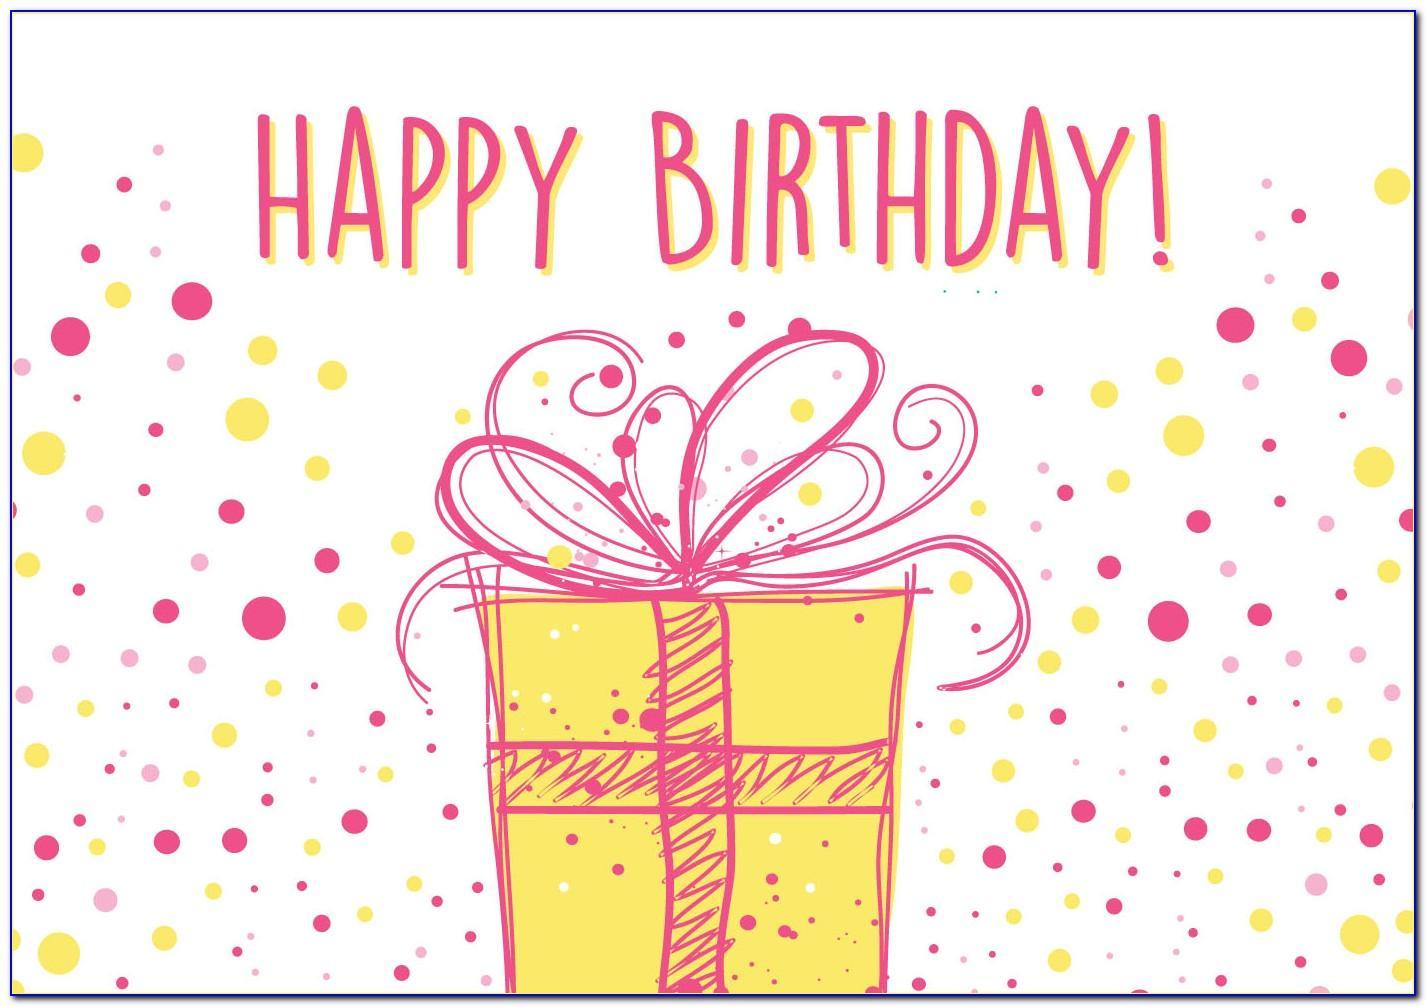 Birthday Card Vector Design Free Download